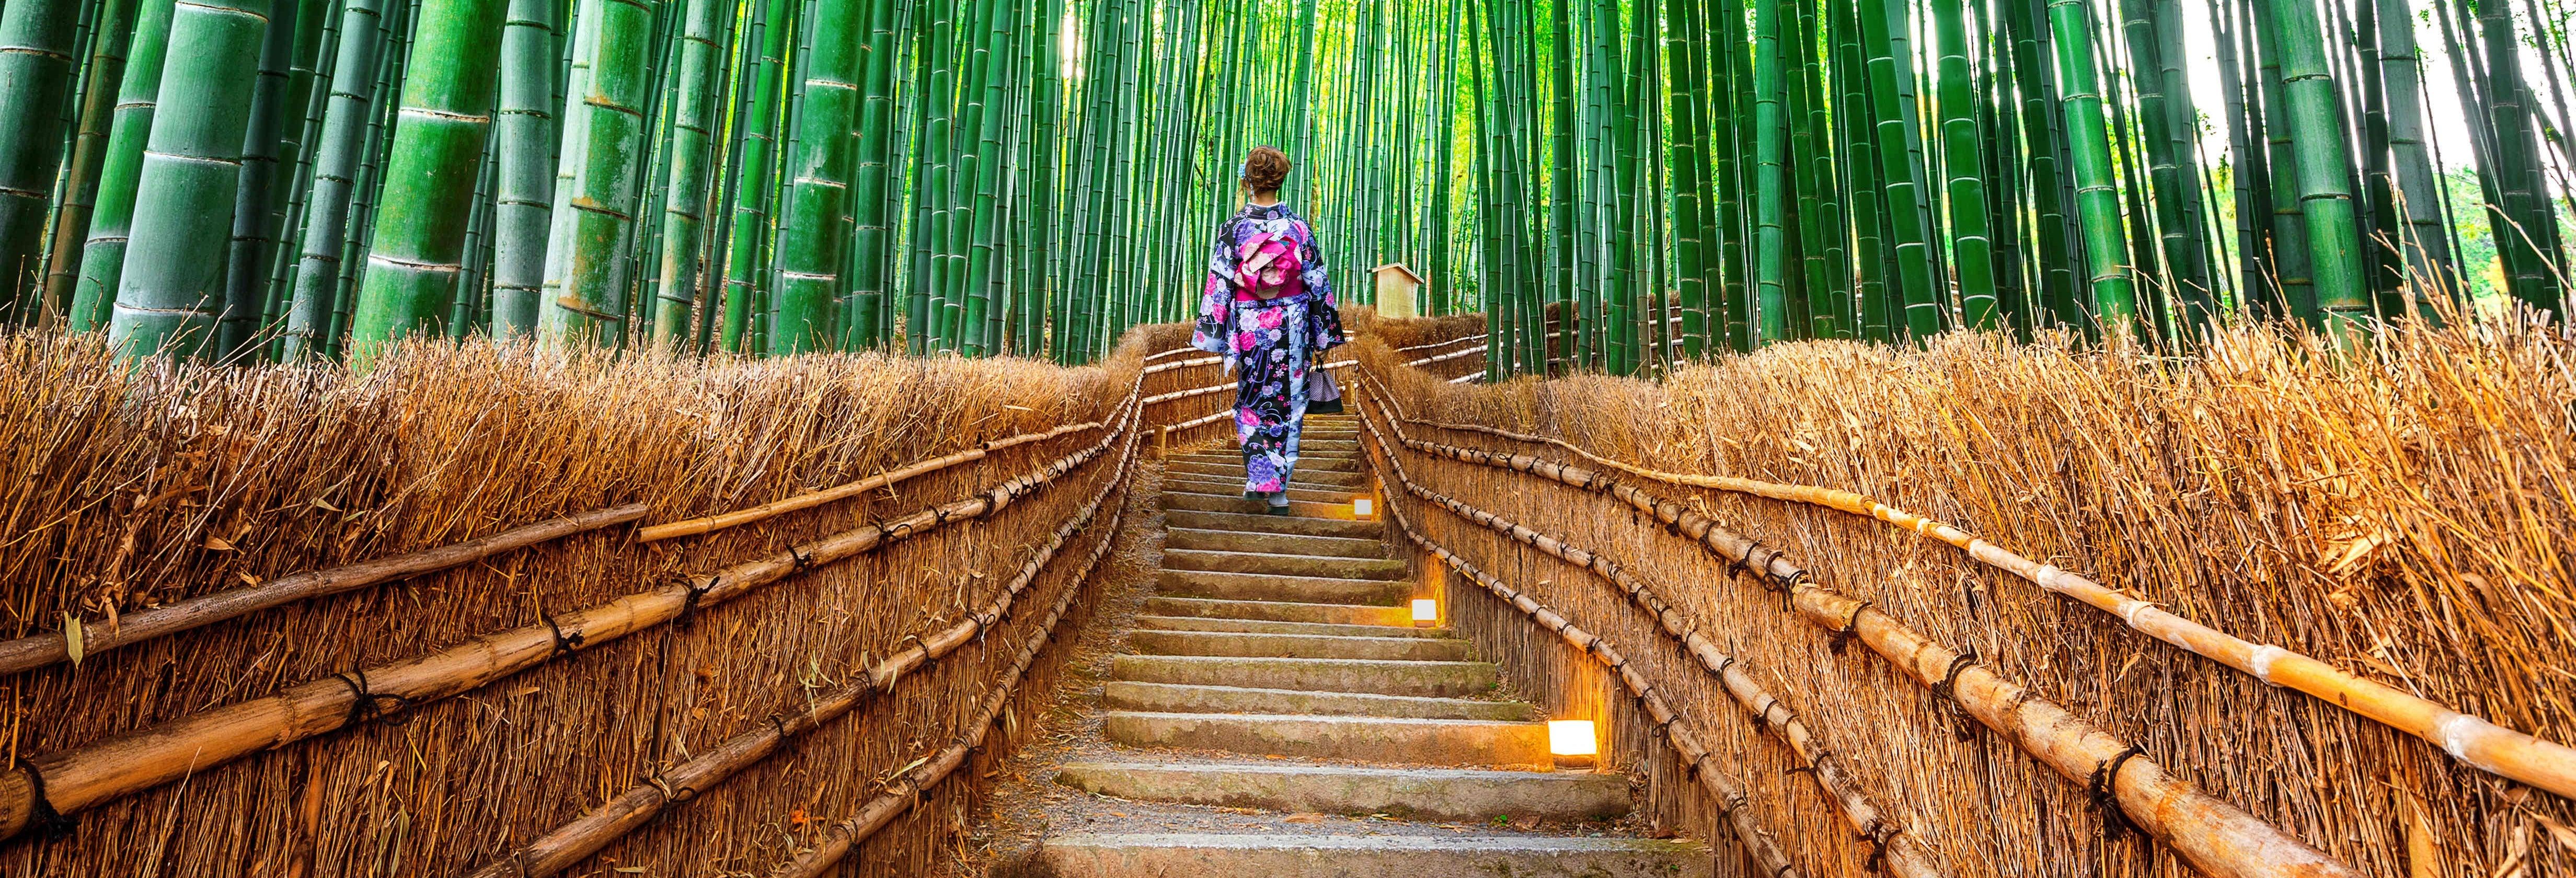 Excursion à Nara et Arashiyama